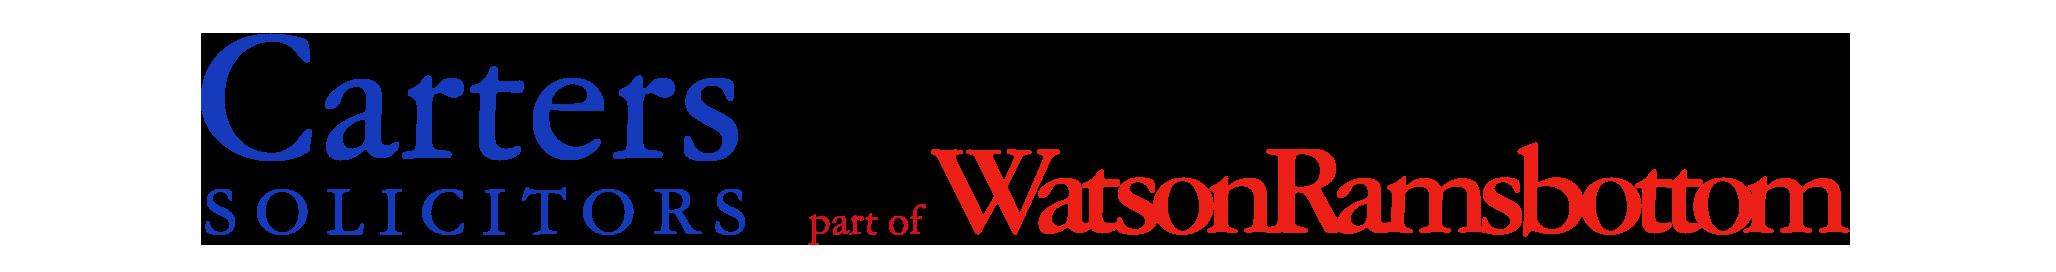 CSWR letterhead header image v.1b